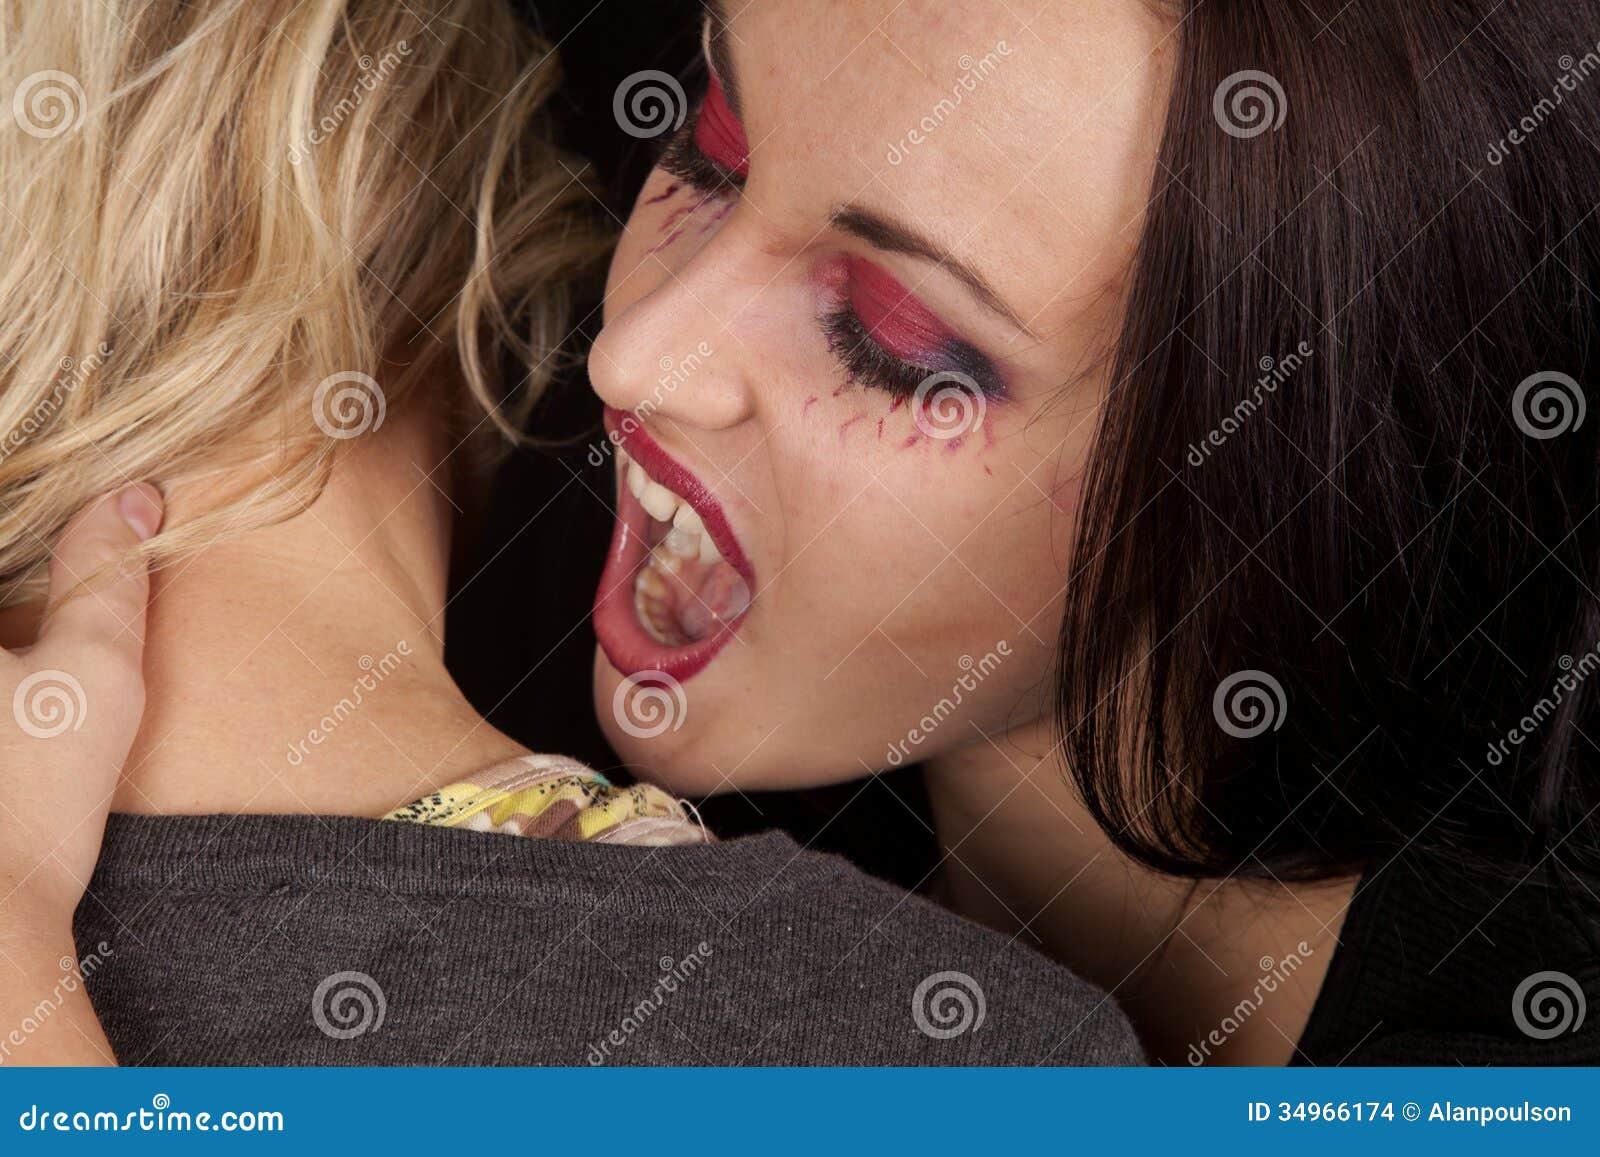 vampire bite Female